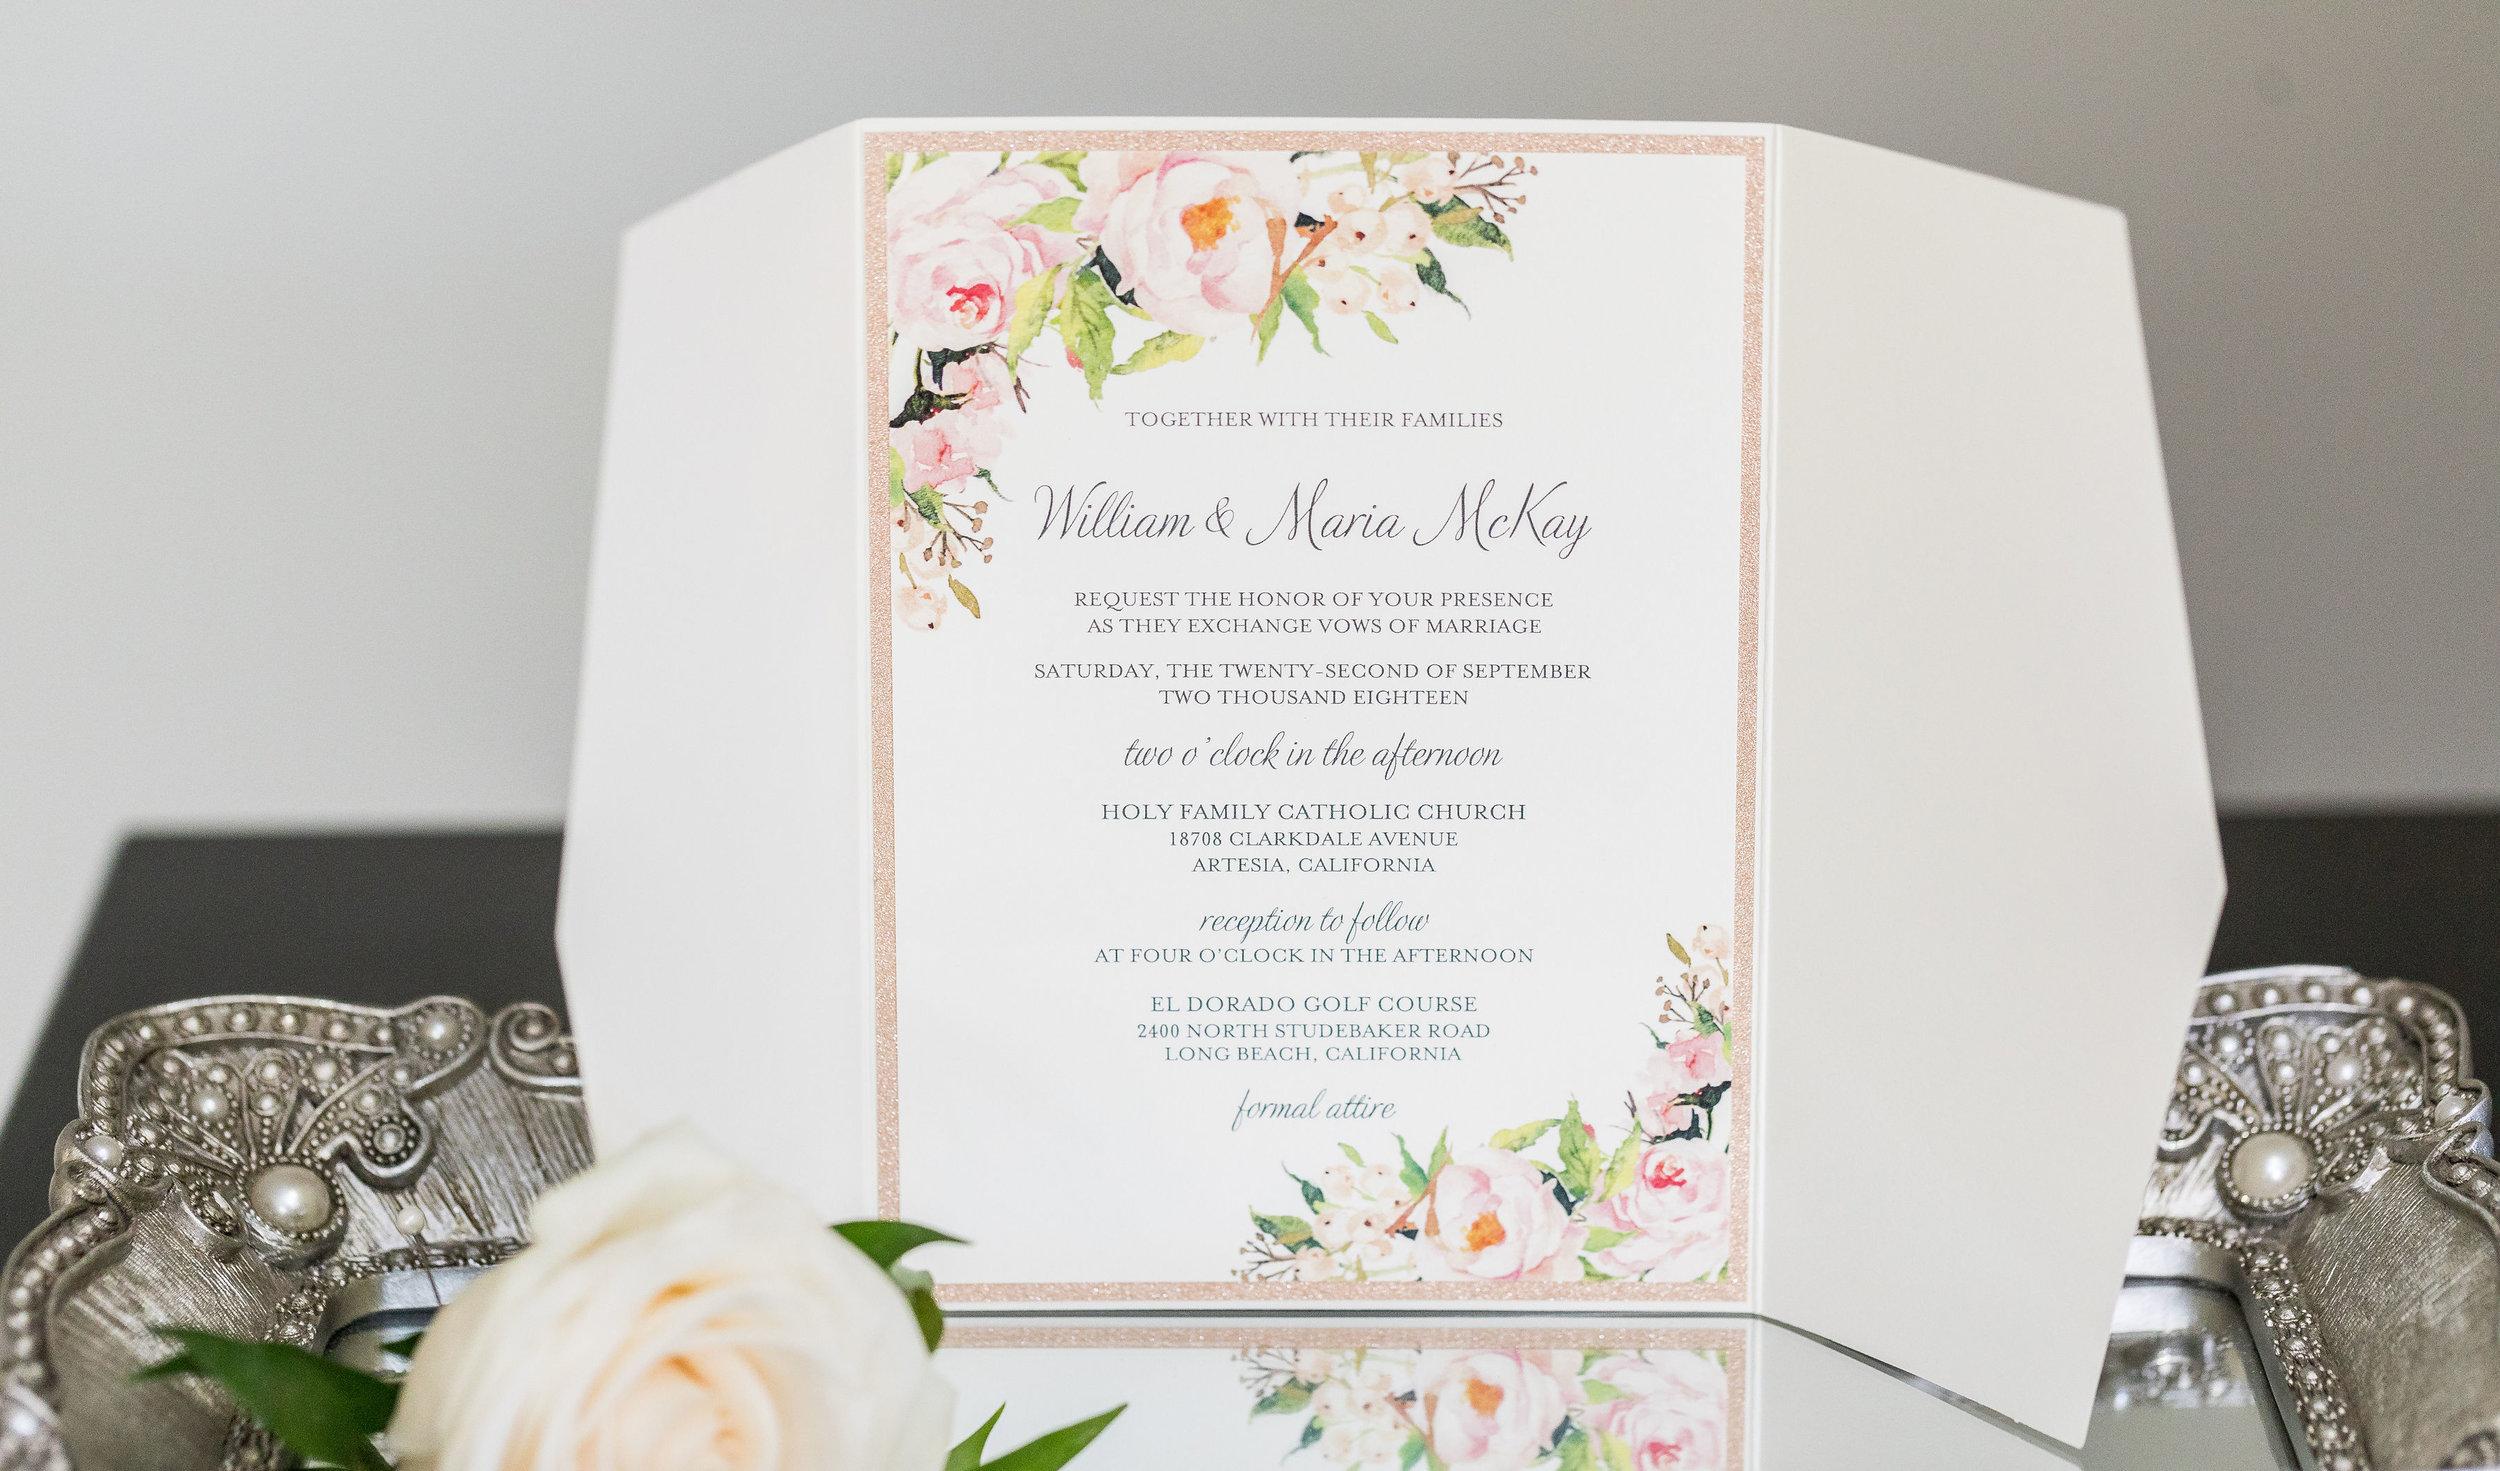 ! Beautiful photo of wedding invitation on tray mirror with boutennier.jpg